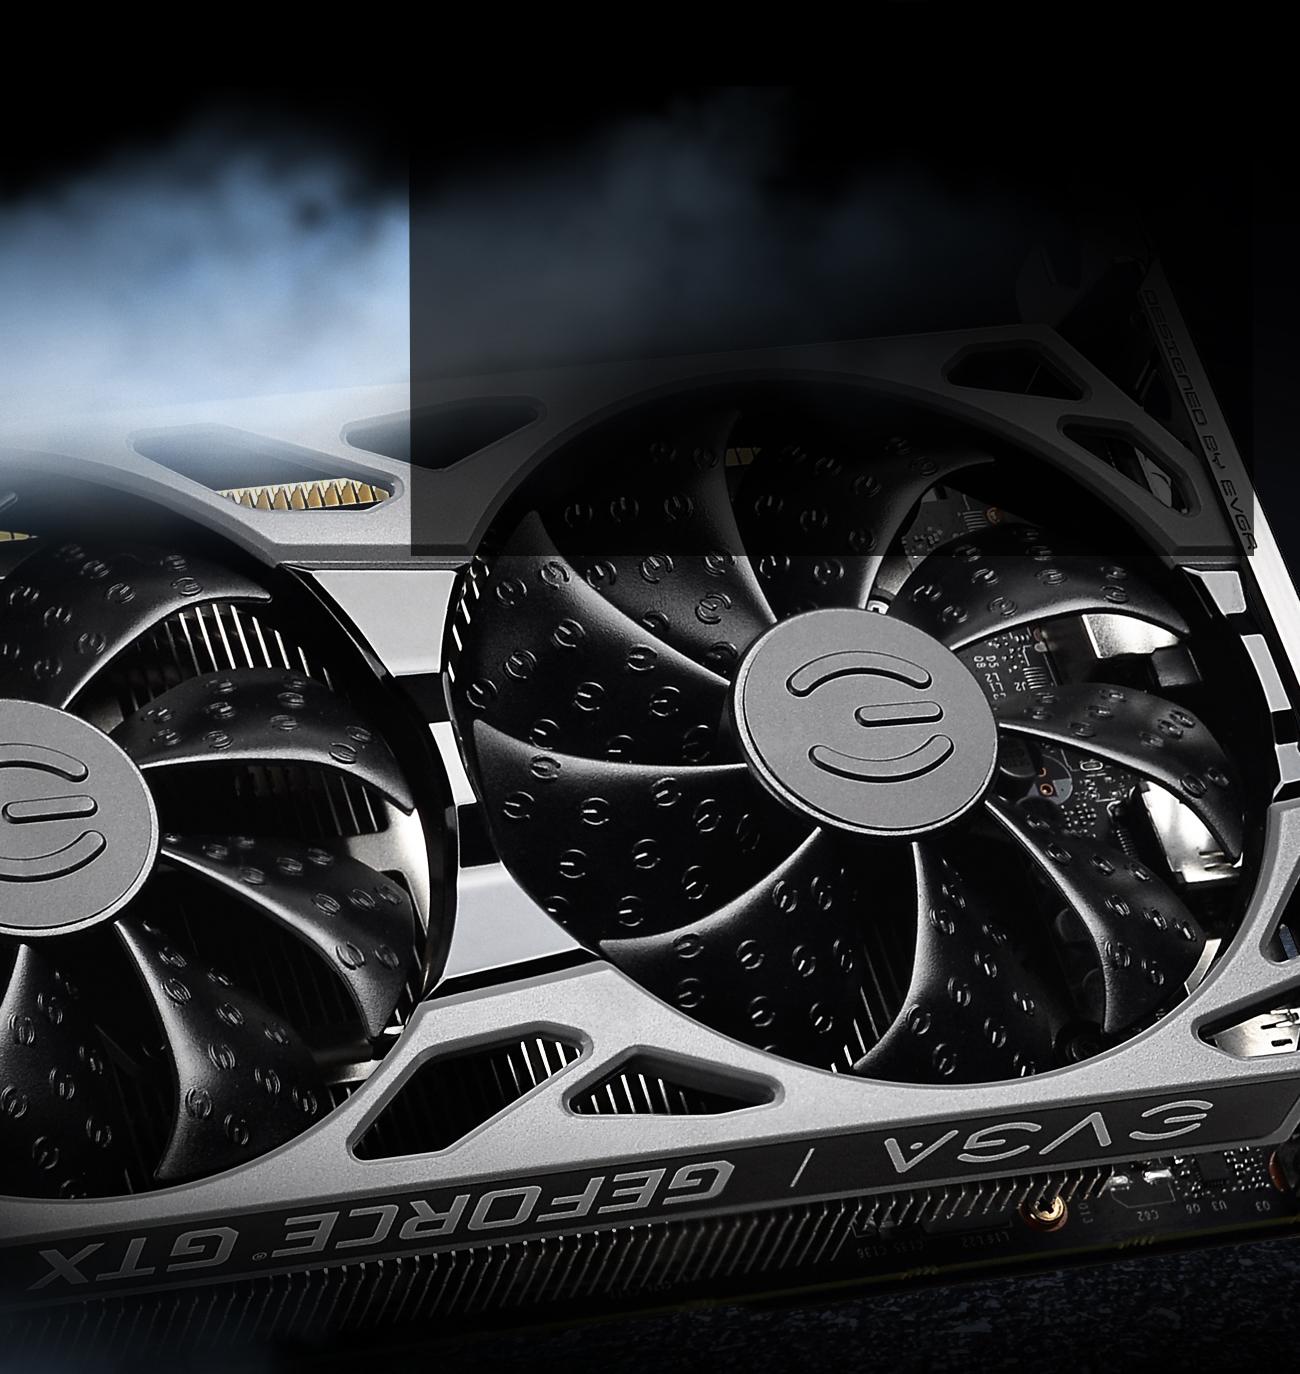 EVGA GeForce GTX 1660 SUPER and GeForce GTX 1650 SUPER gaming cards close-up